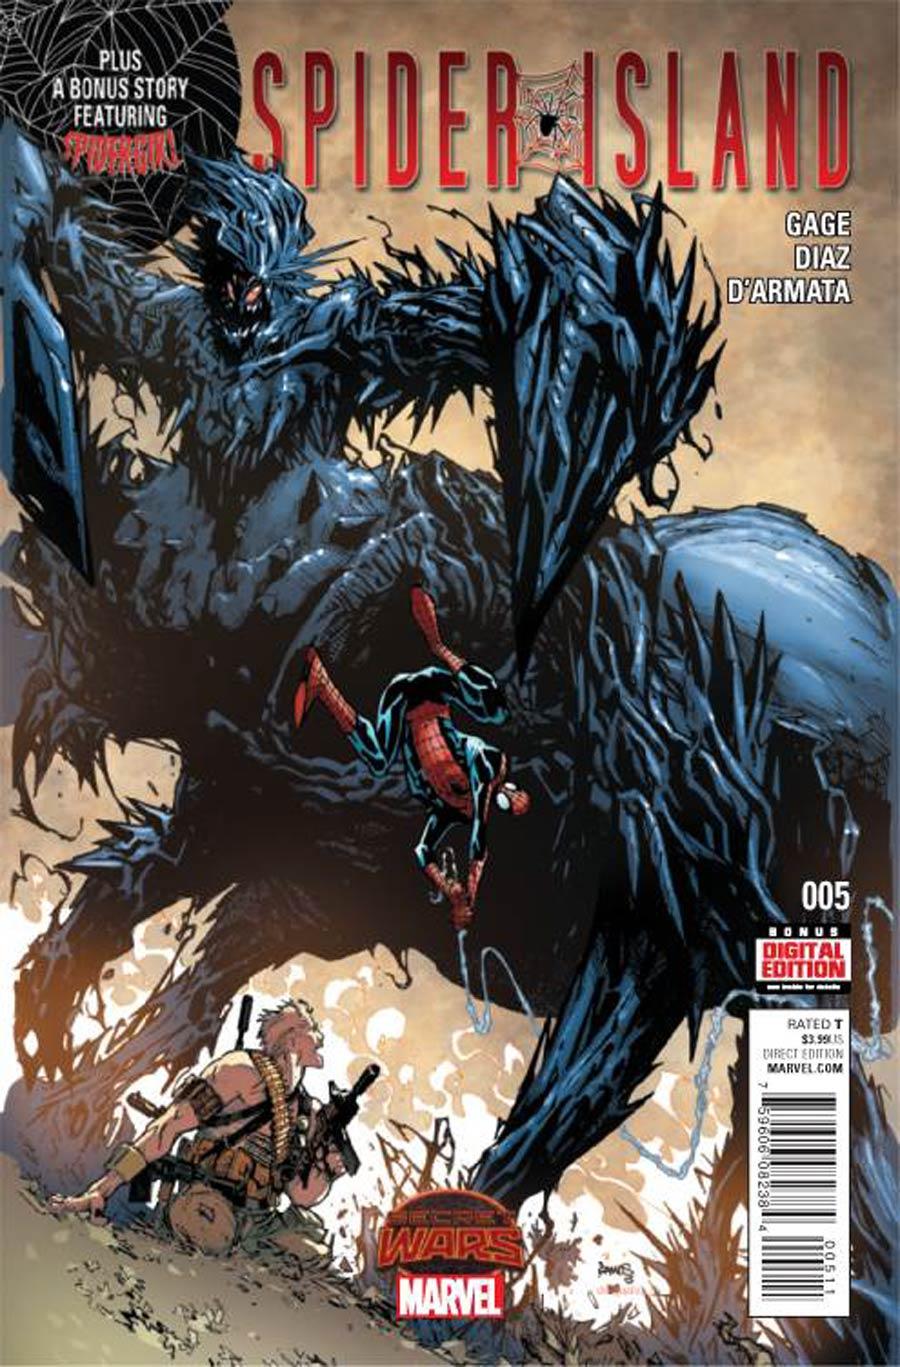 Spider-Island #5 (Secret Wars Warzones Tie-In)